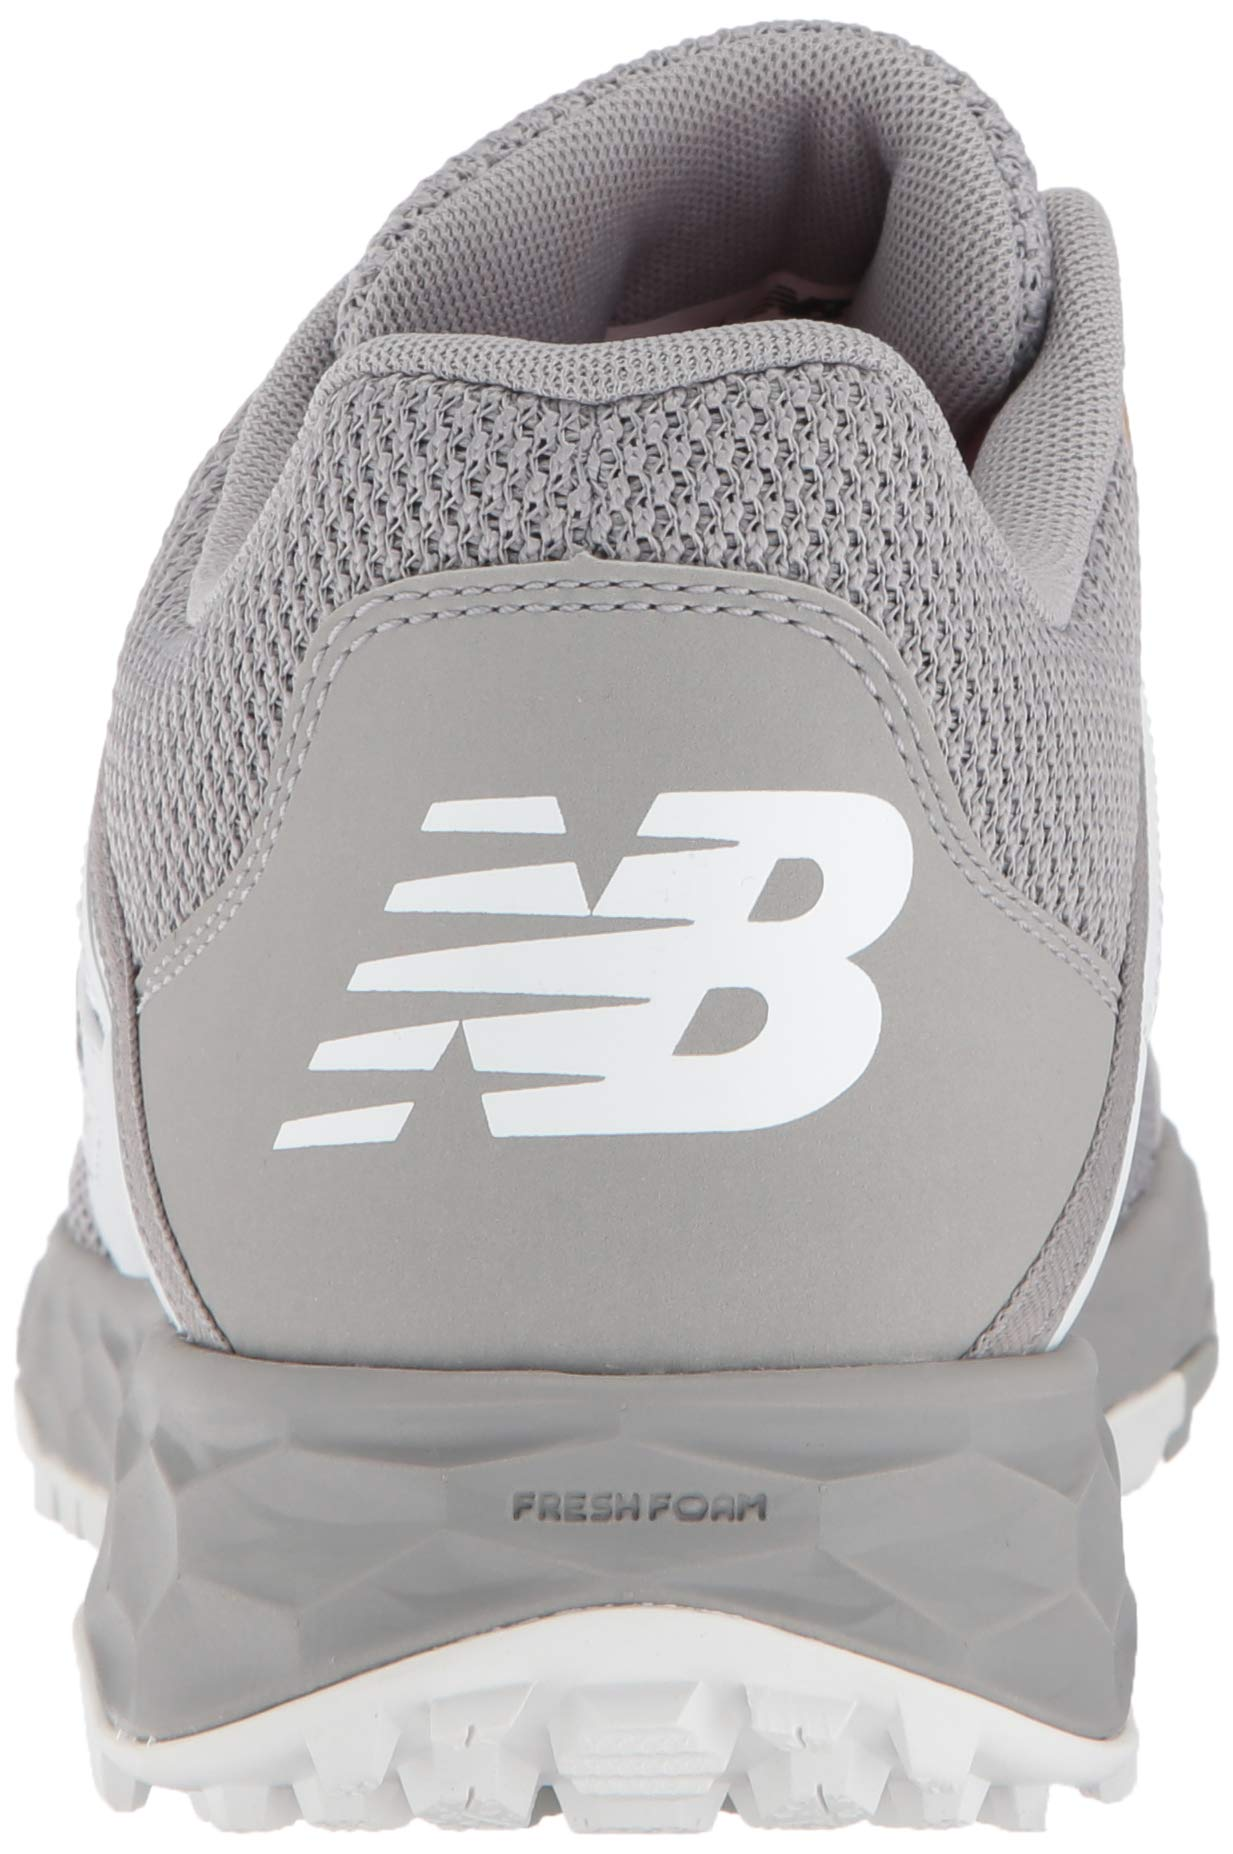 New Balance Men's 3000v4 Turf Baseball Shoe, Grey/White, 5 D US by New Balance (Image #2)